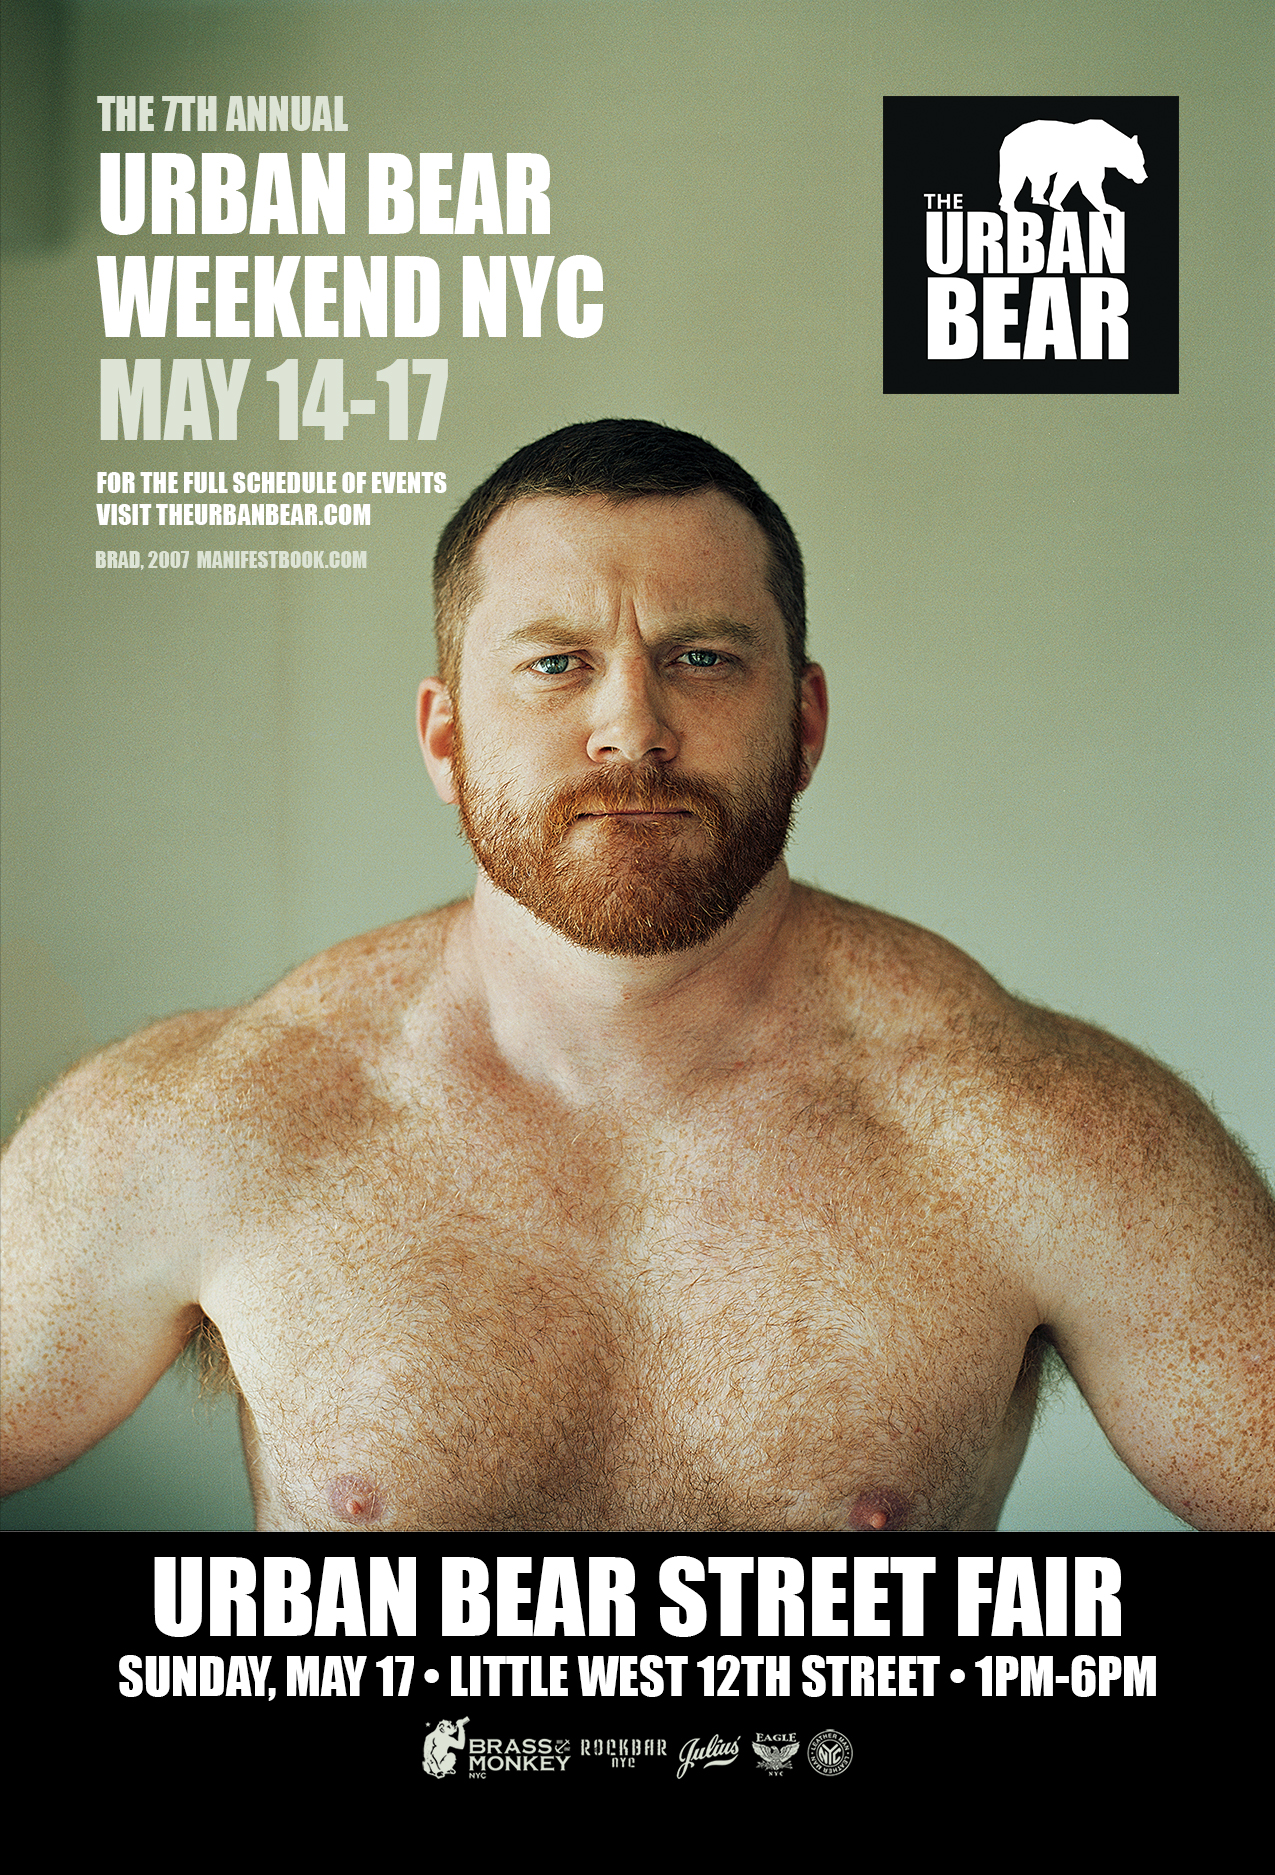 Urban-Bear-Weeknd-2015-General-4x62.jpg